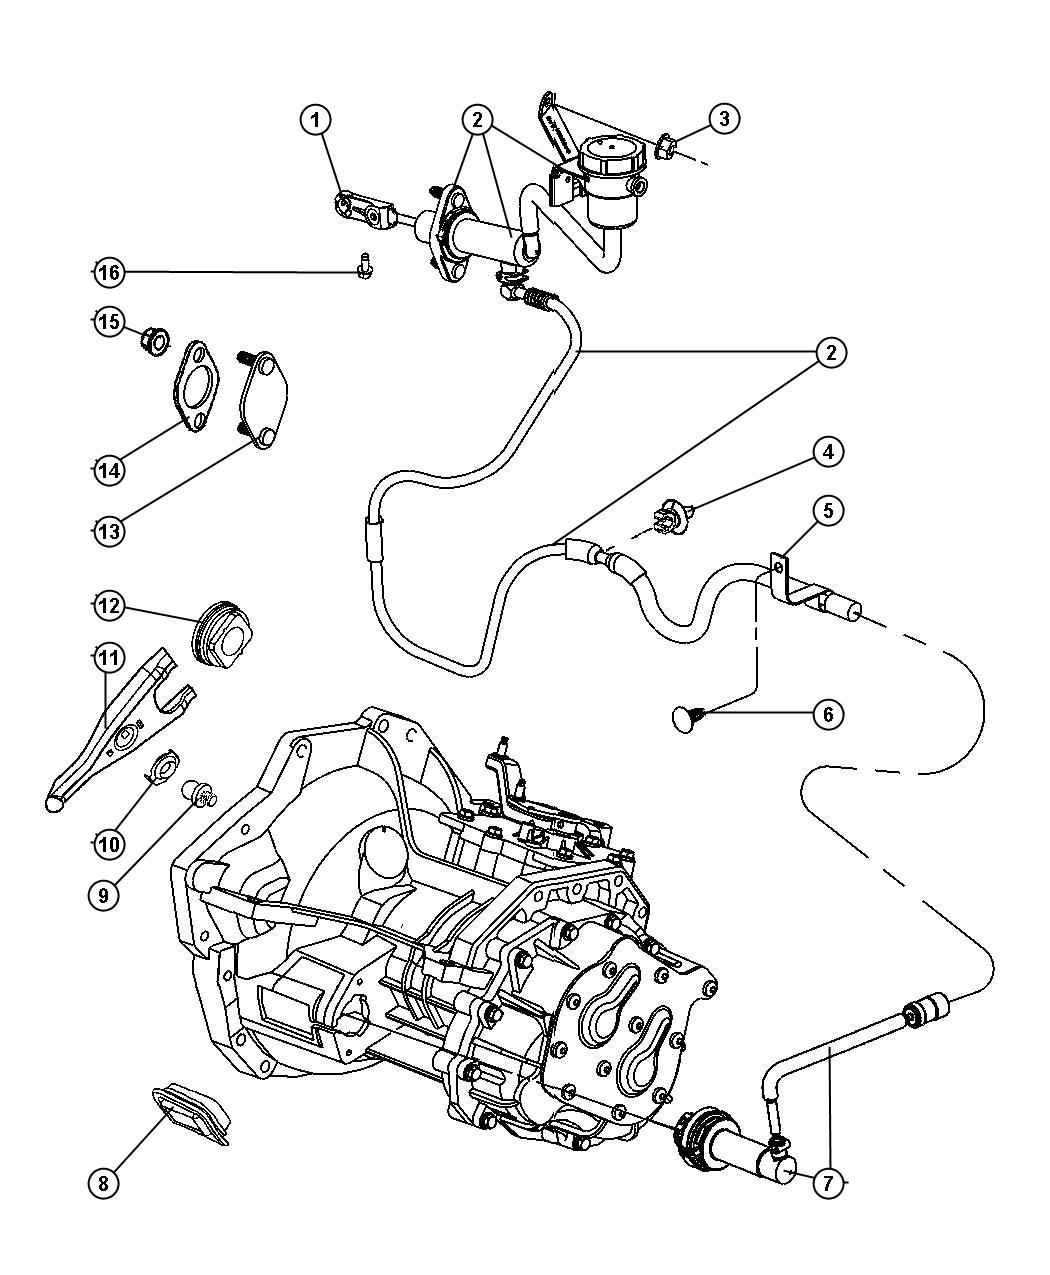 1995 dodge neon engine diagram